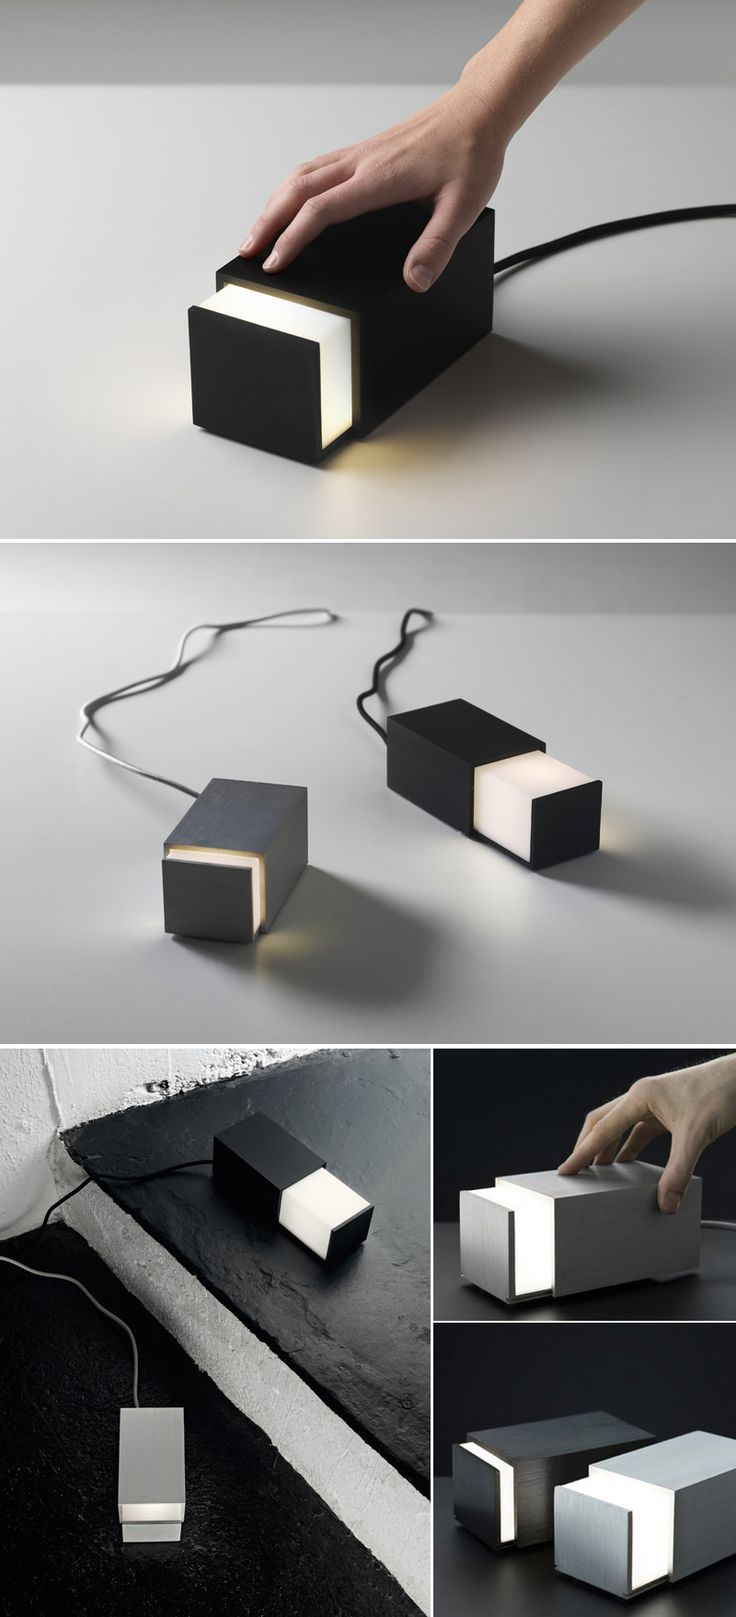 Box Light by Jonas Hakaniemi for Design House Stockholm.